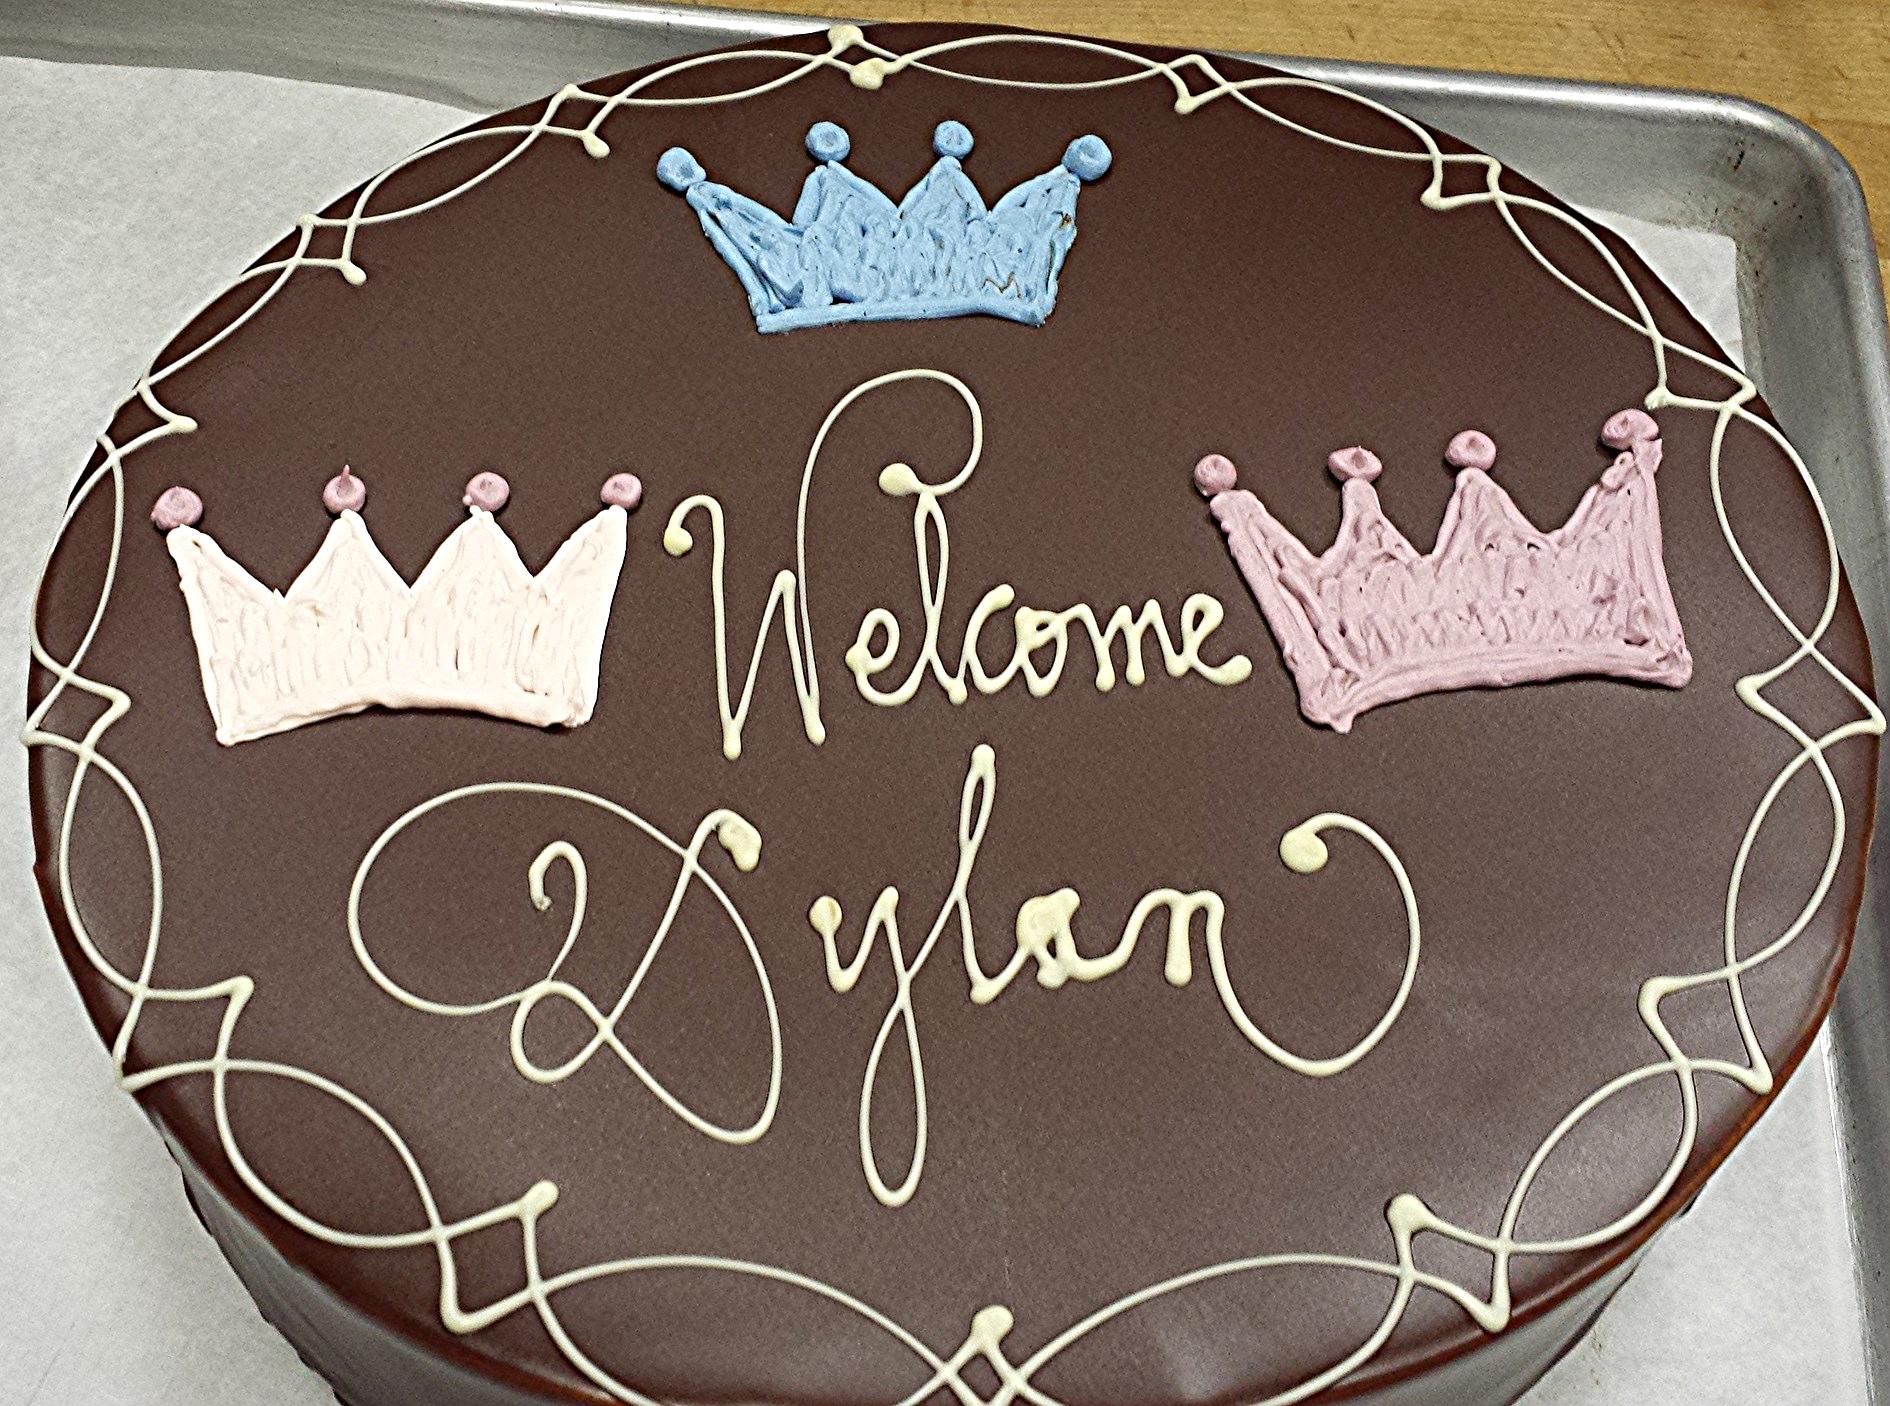 10 inch chocolate cake.jpg